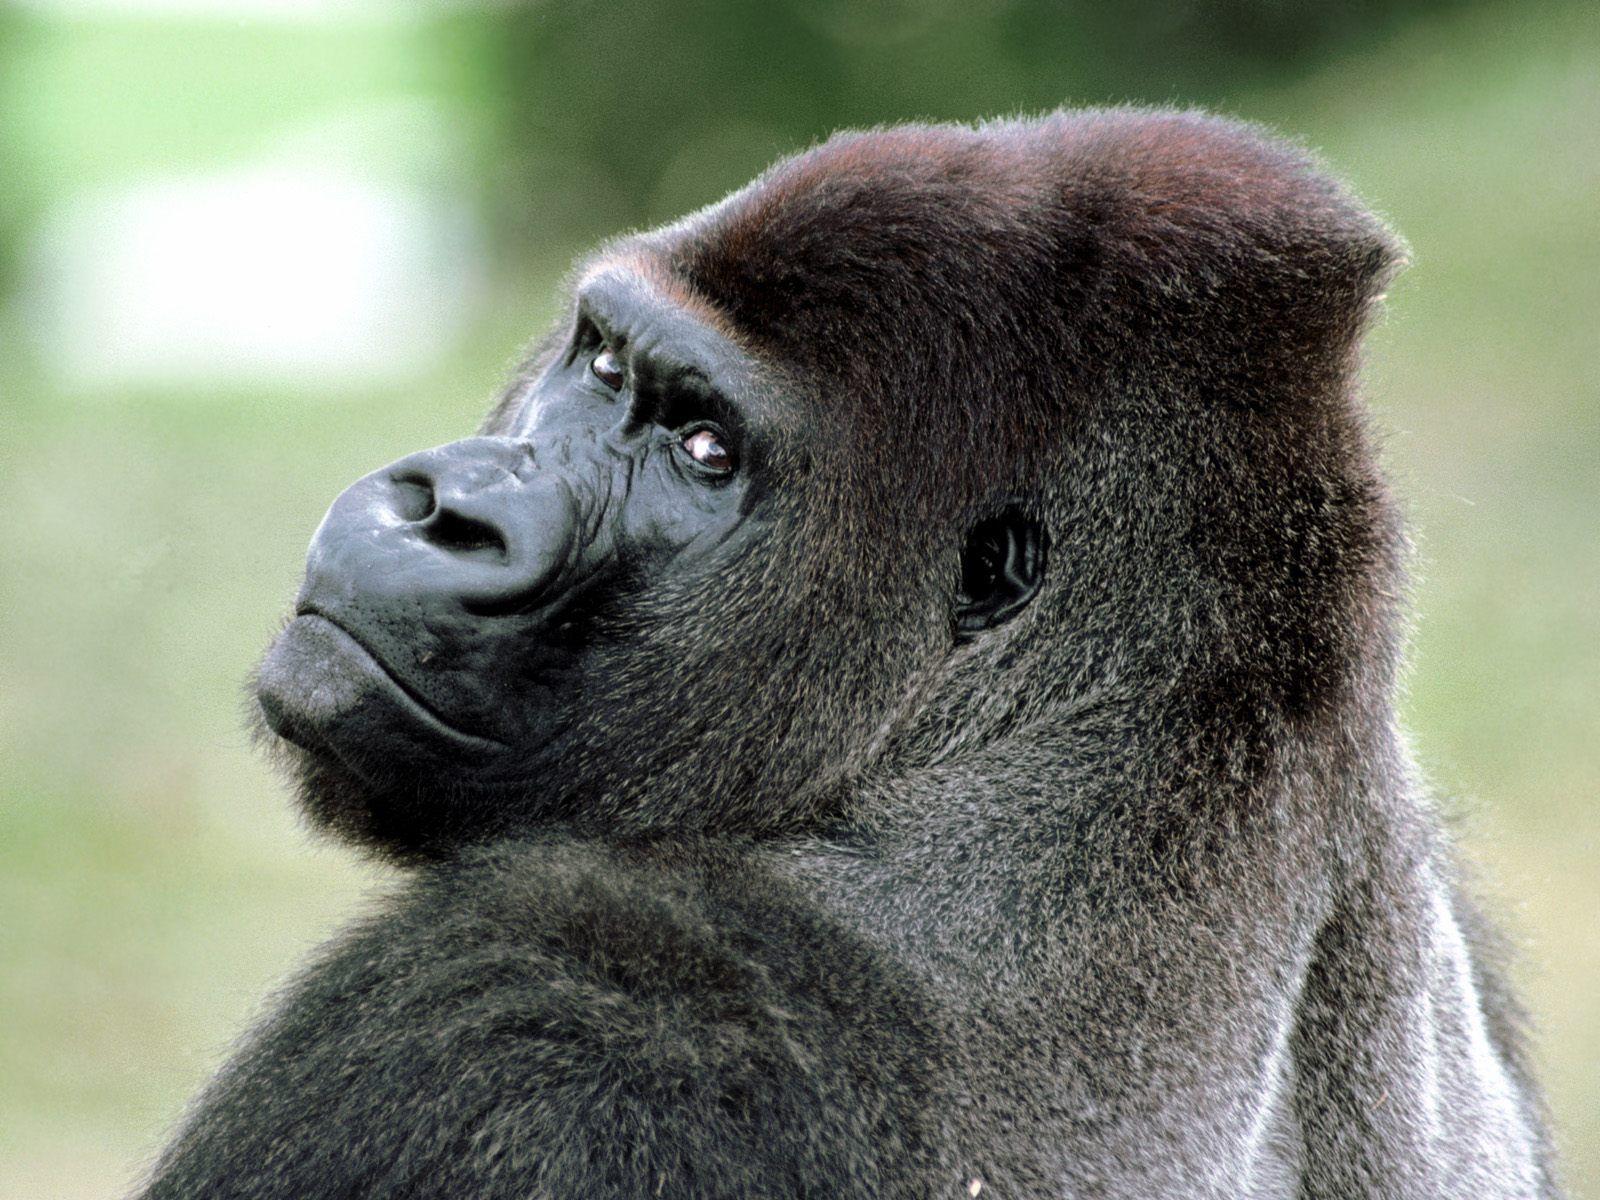 Funny Gorilla wallpaper for desktop Funny Animal 1600x1200